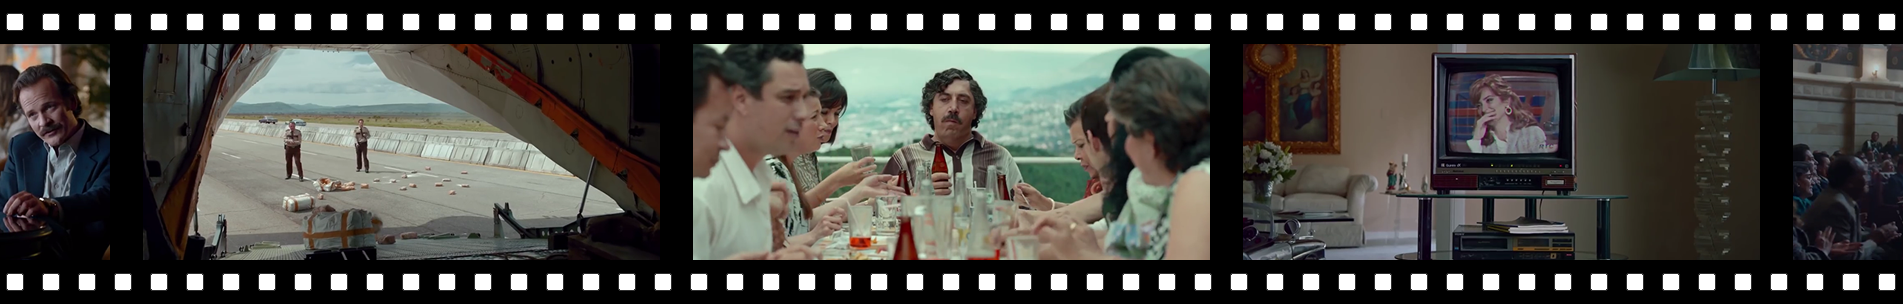 "Pellicule ""Escobar"""